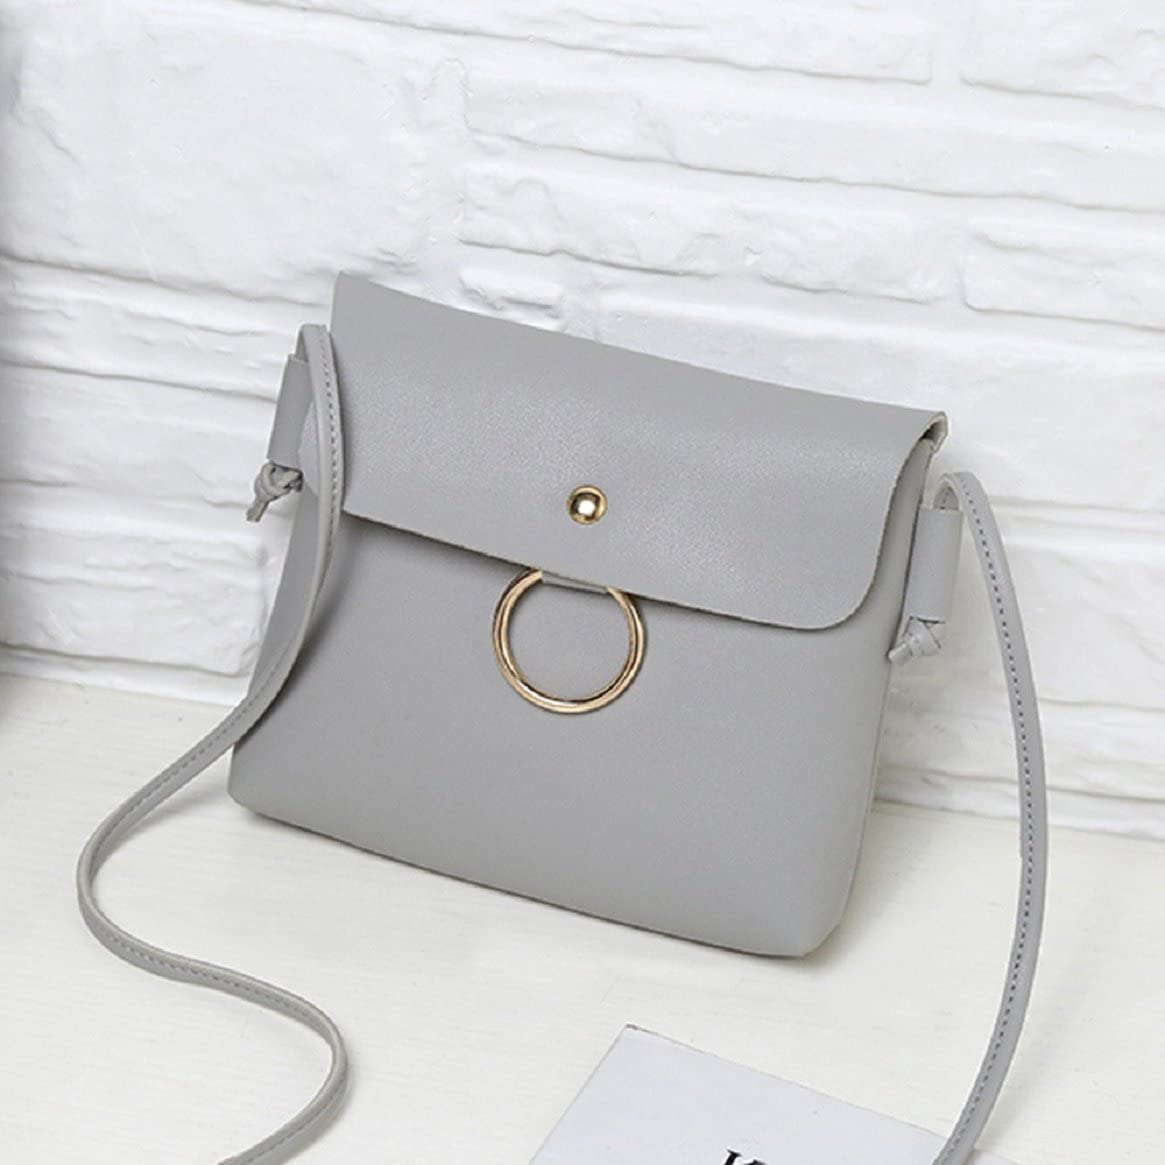 Women Hasp Shoulder Bag PU Leather by Coerni